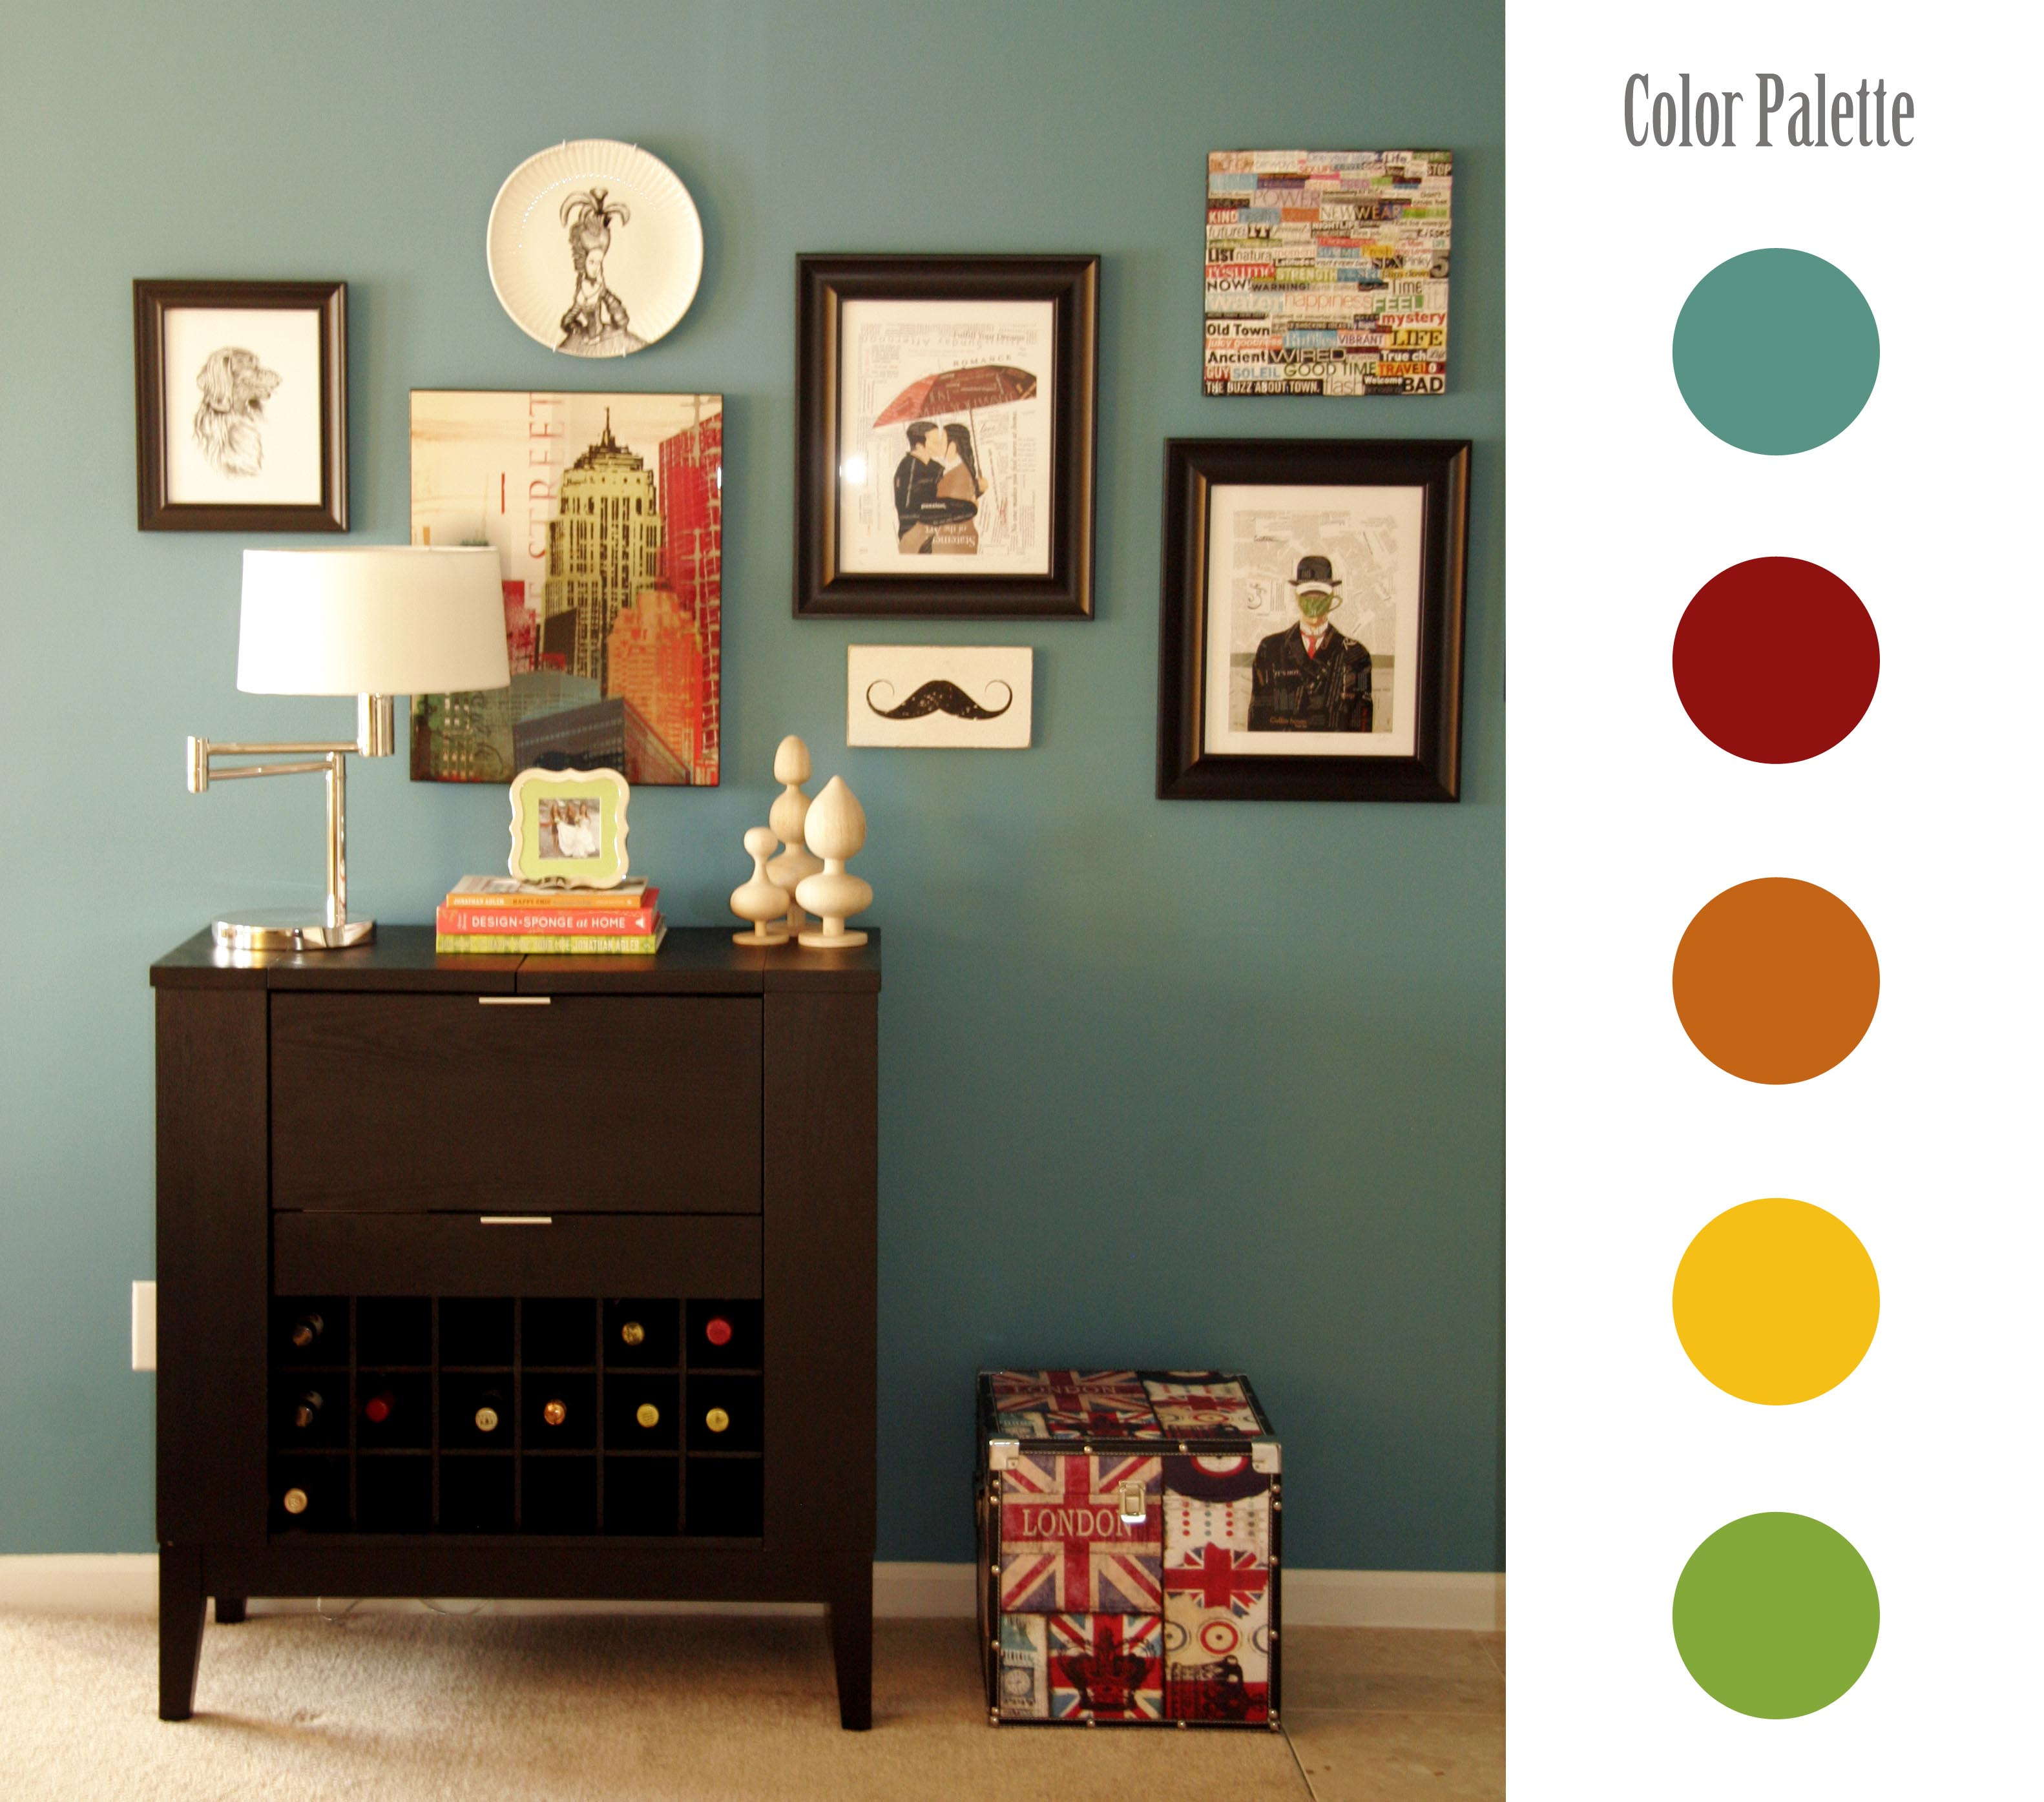 Home Decorating Color Palettes: All Put Together